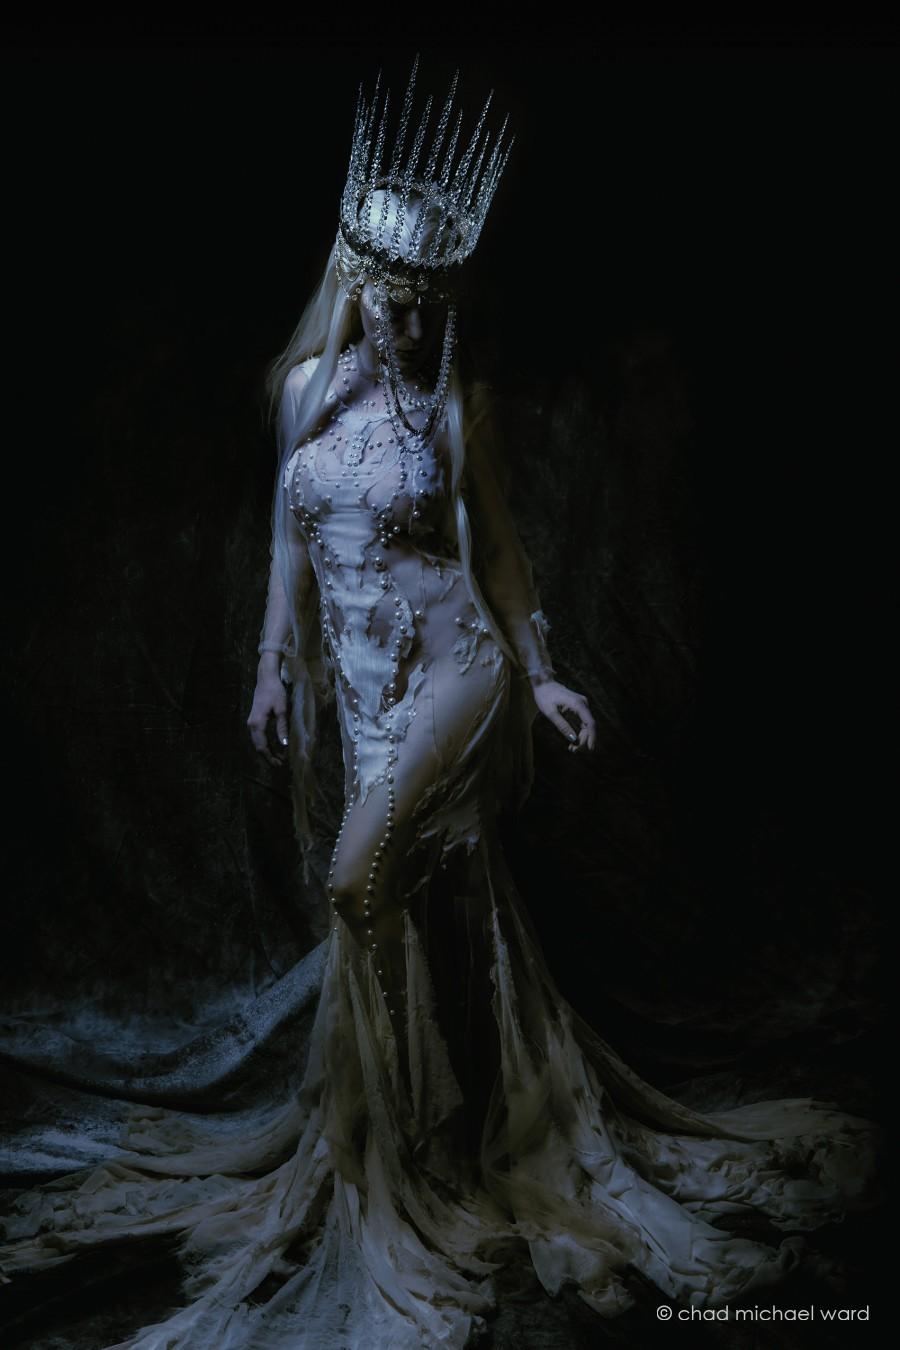 CHAD MICHAEL WARD: Horror and Fantasy Art, Science Fiction